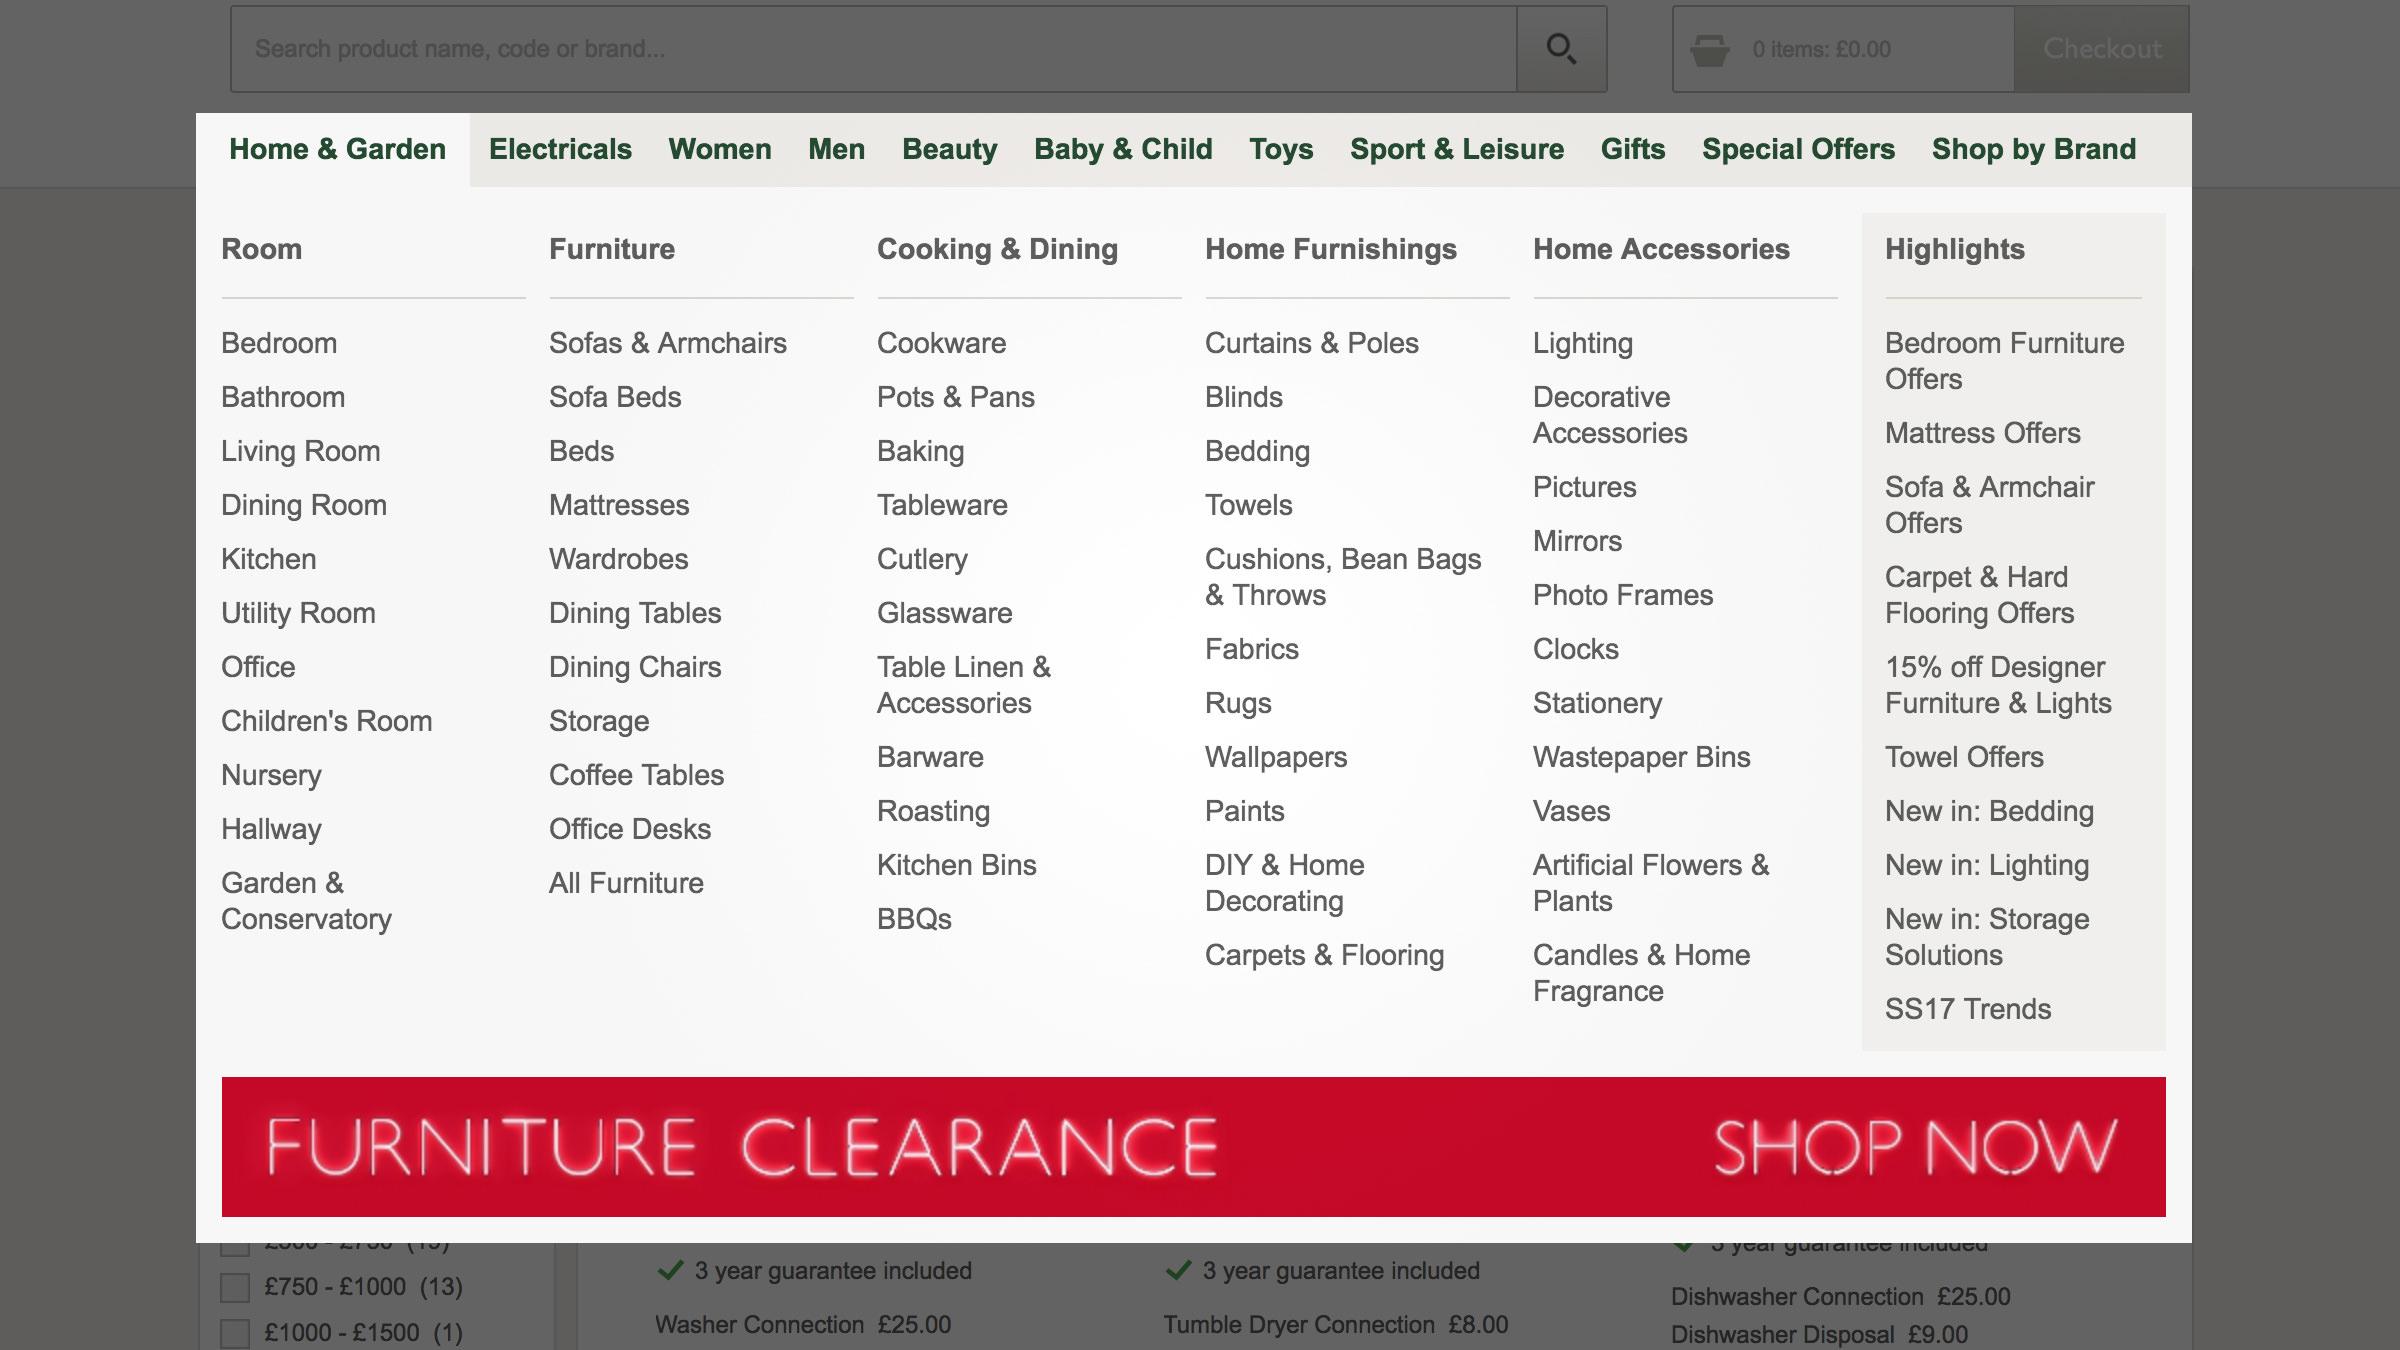 An example of descriptive navigation menu.